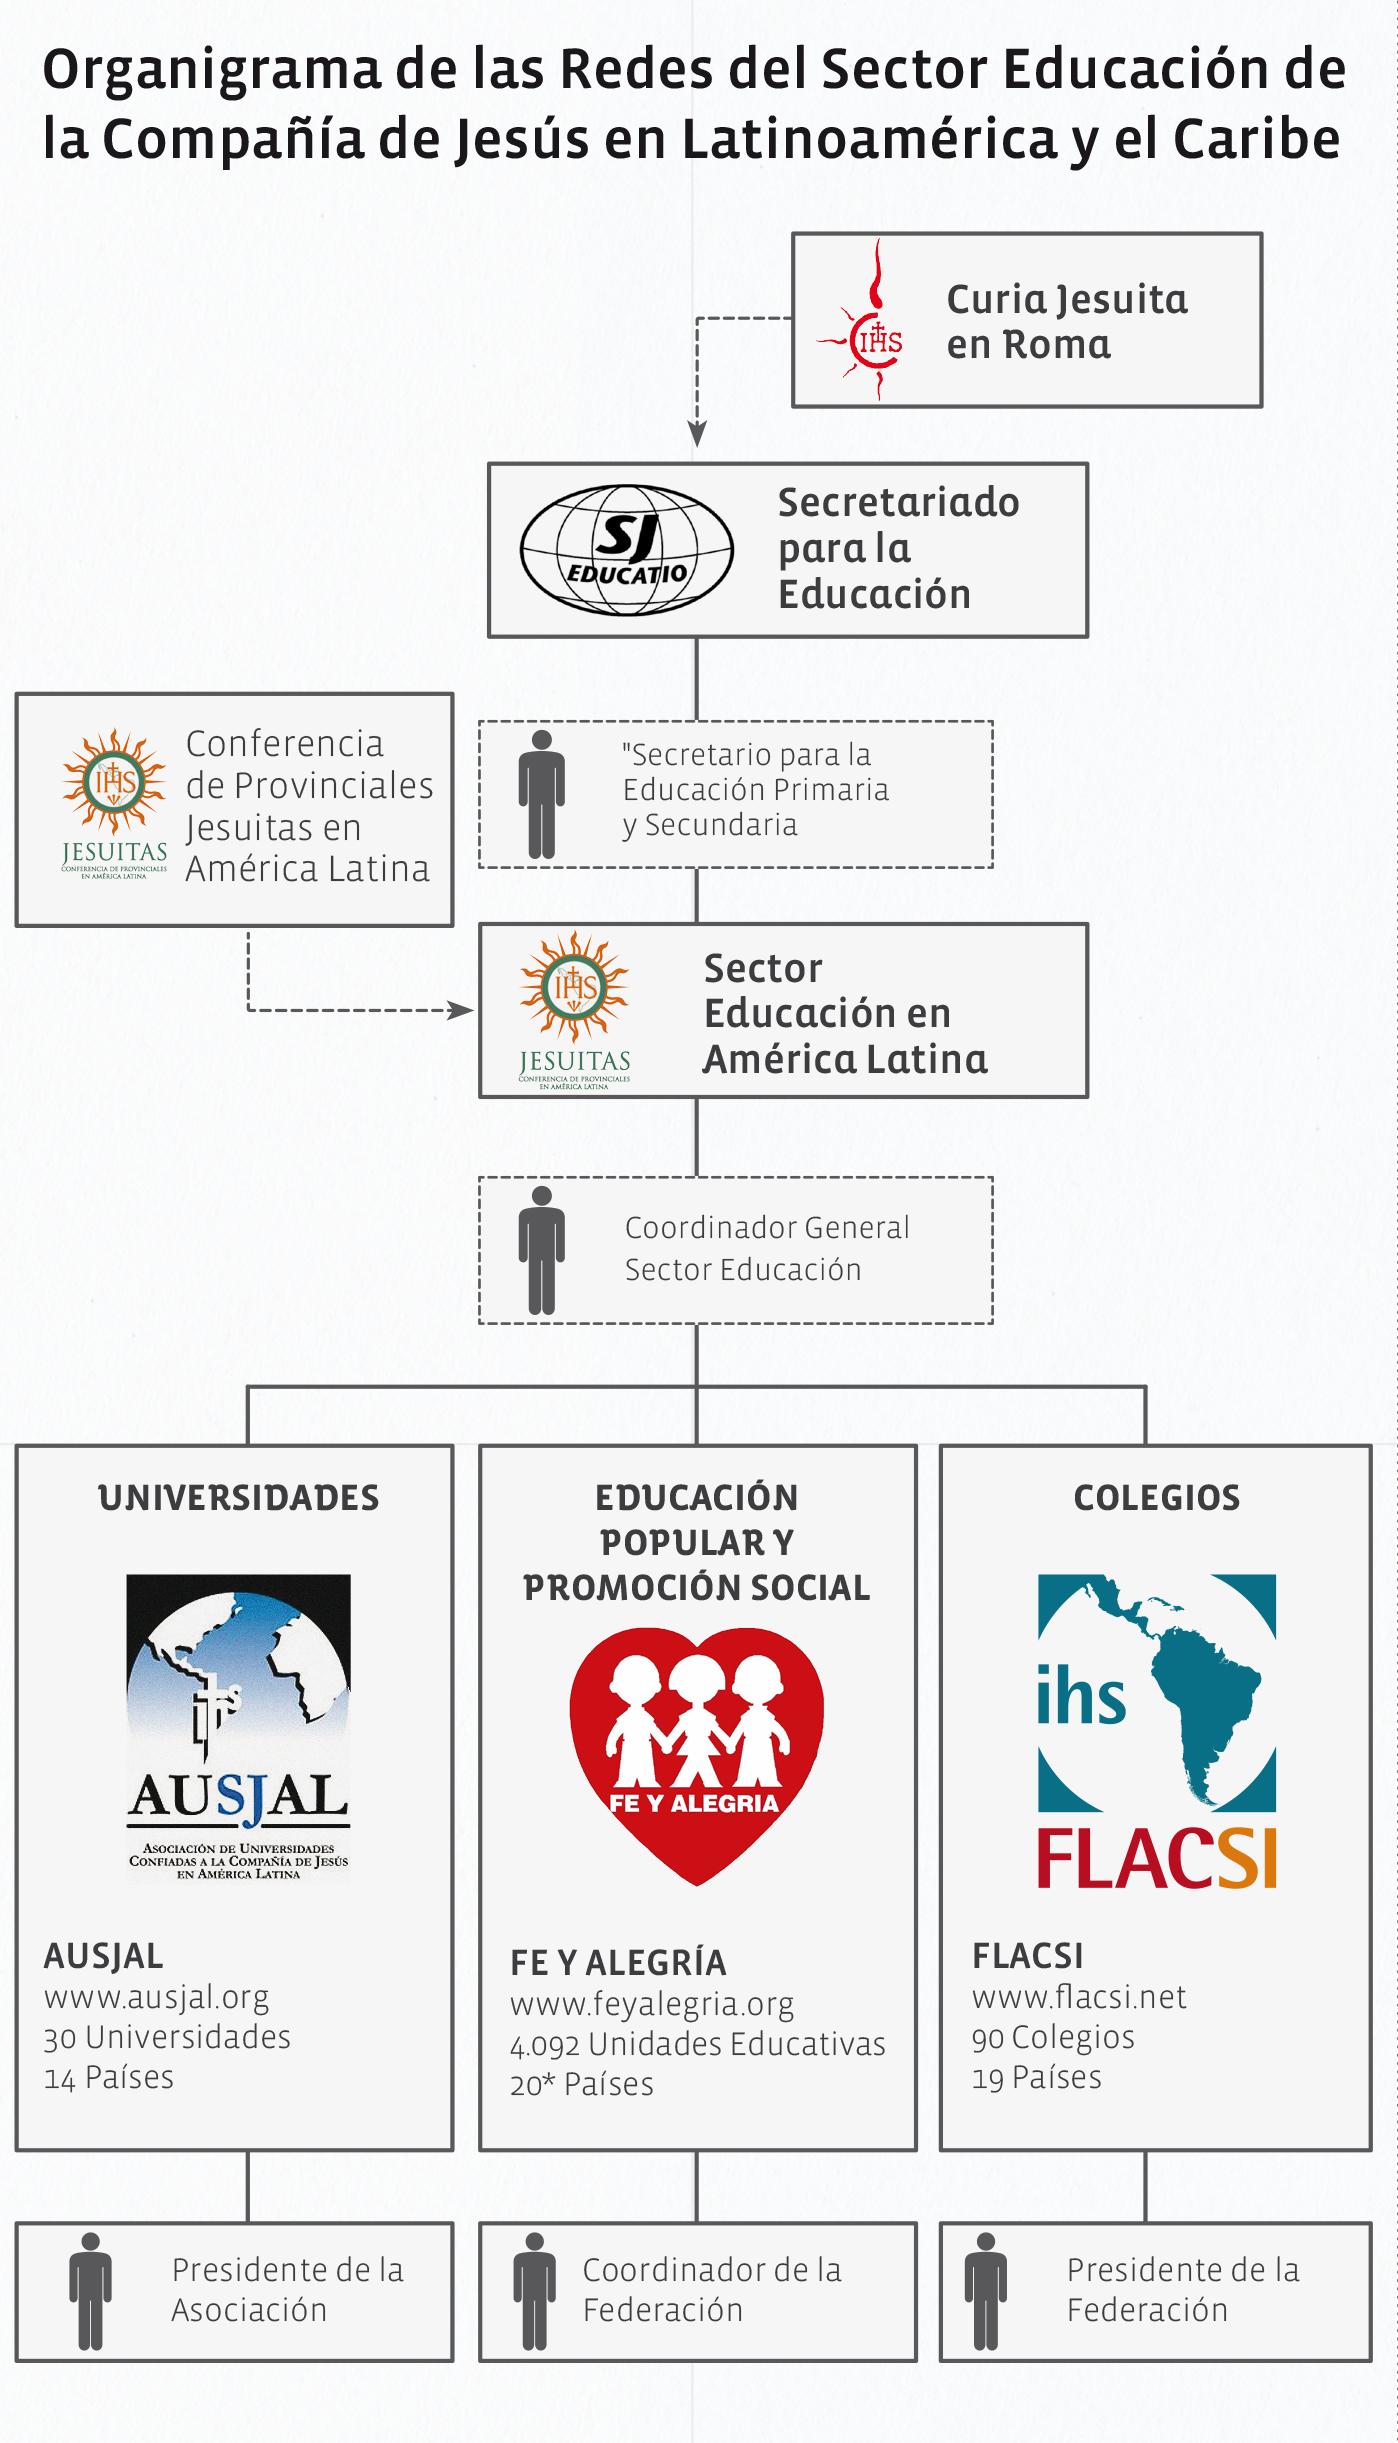 organigrama-FLACSI-en-LAC